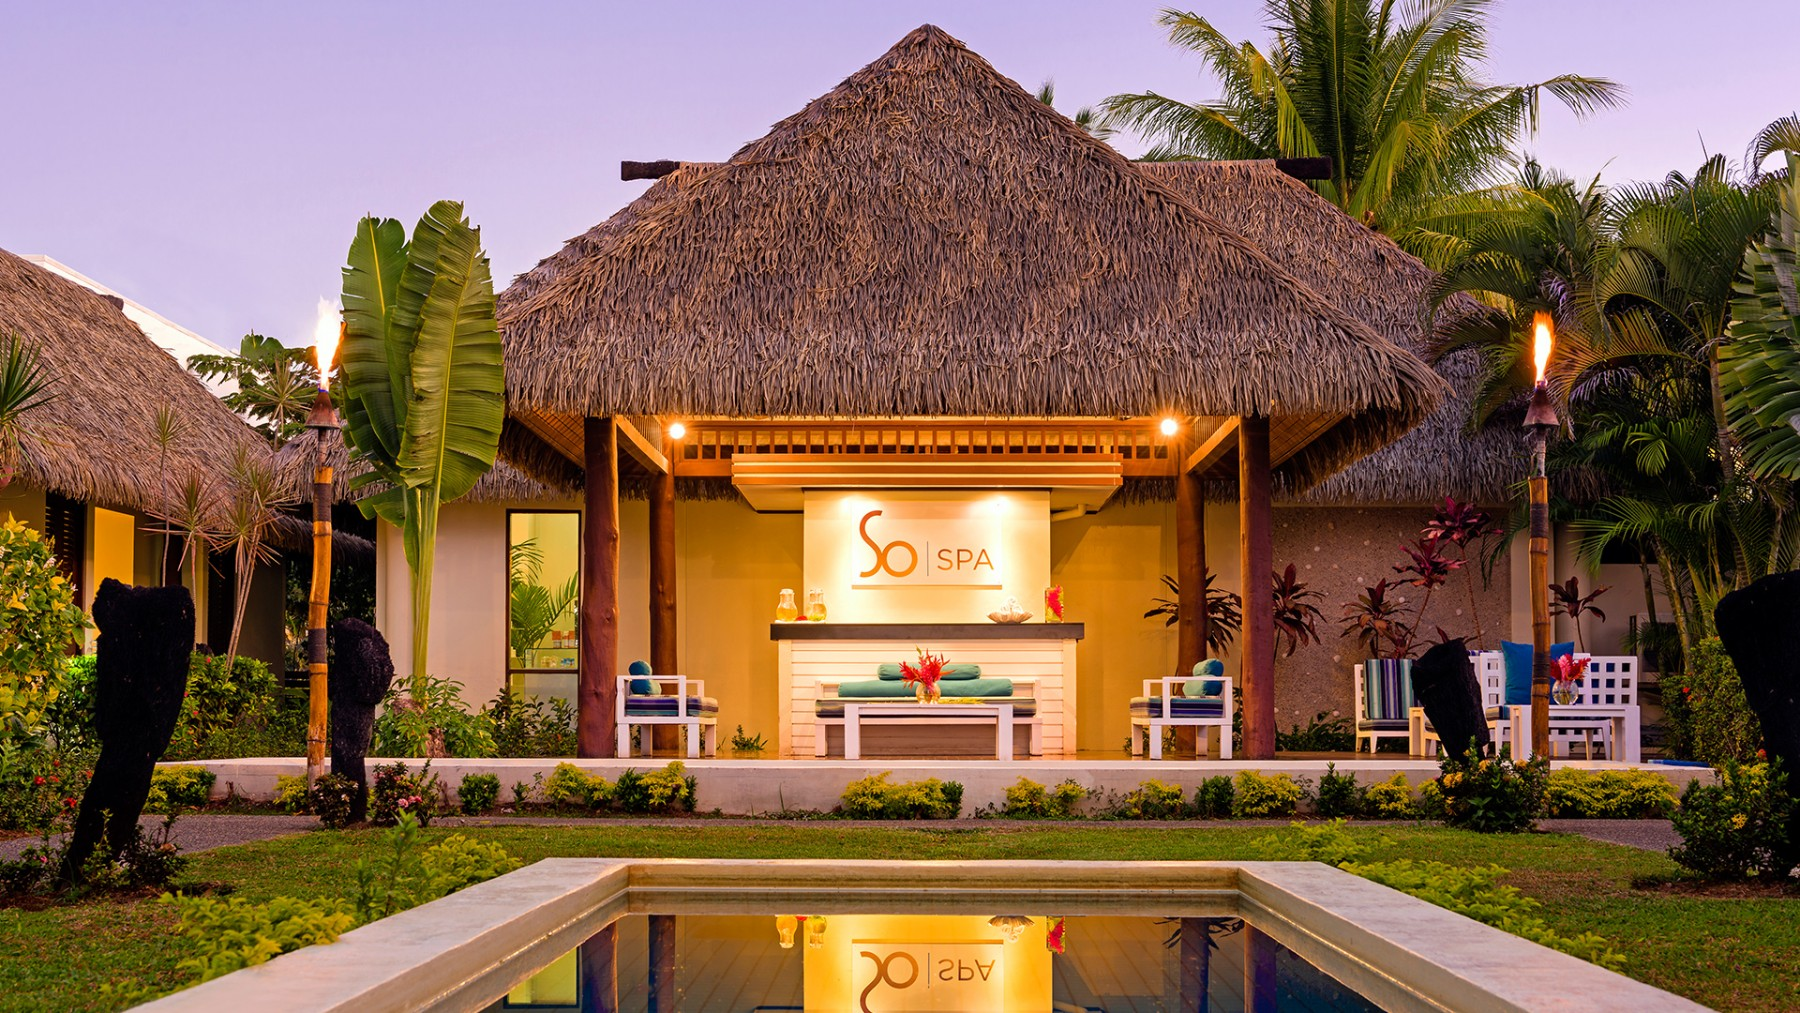 SO Spa at Sofitel Fiji Resort